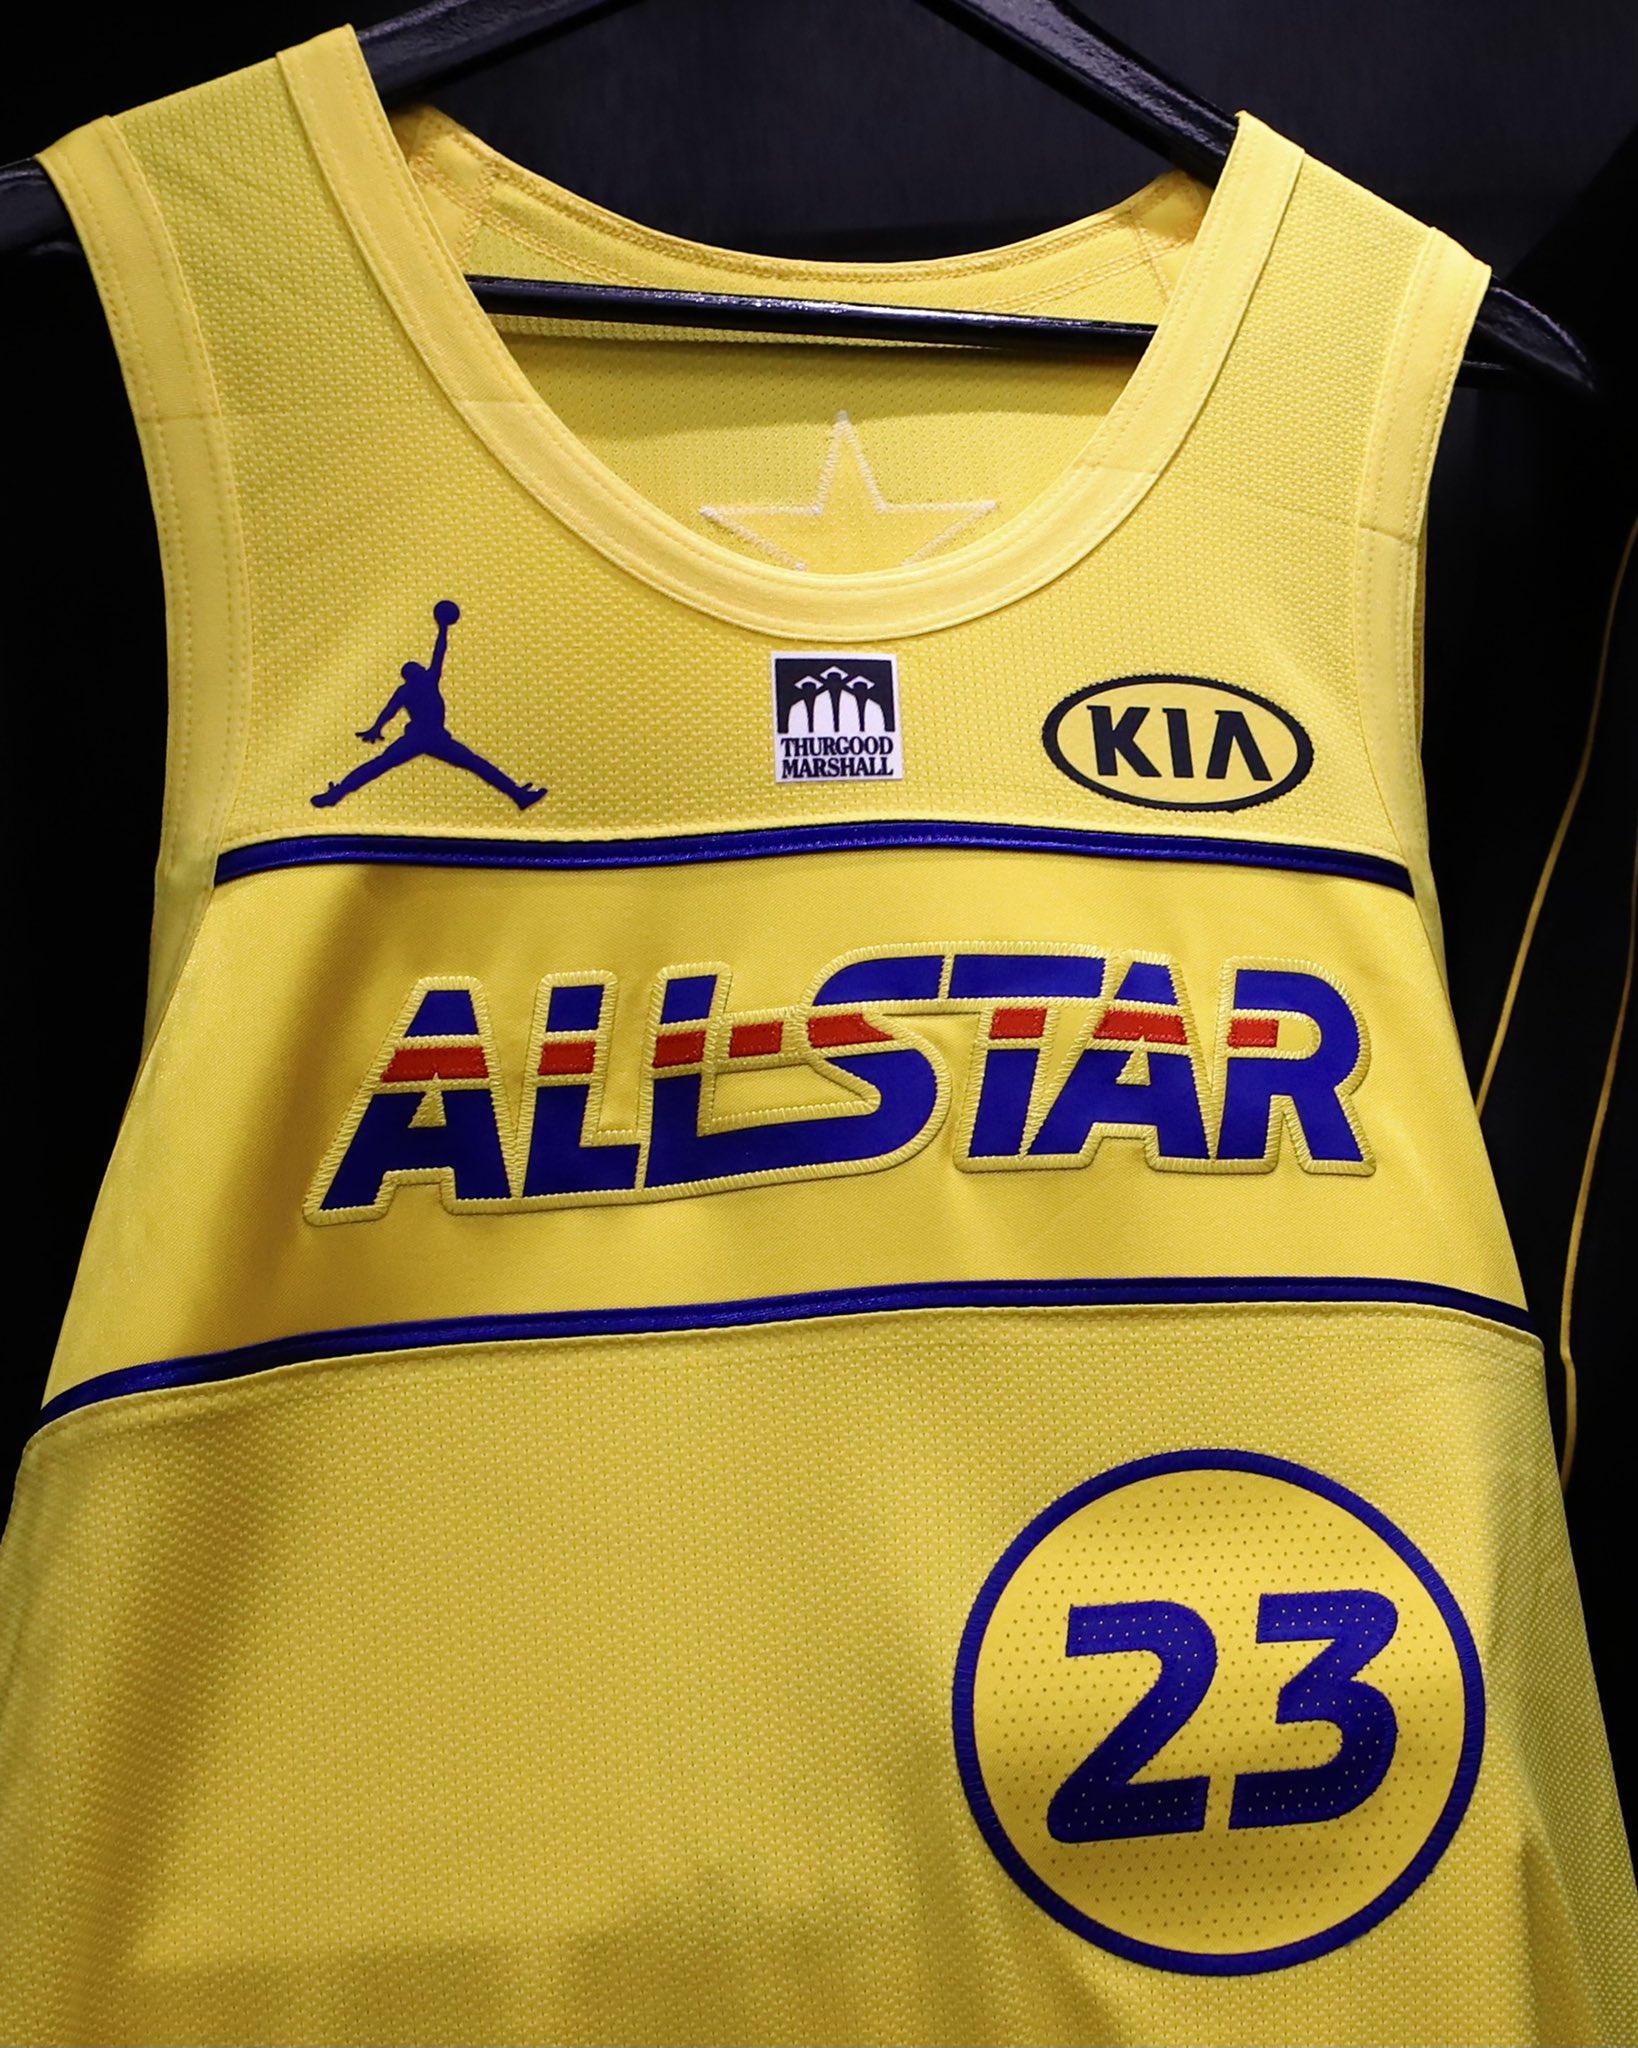 NBA官推晒出本届全明星赛球衣:勒布朗队黄色,杜兰特队蓝色